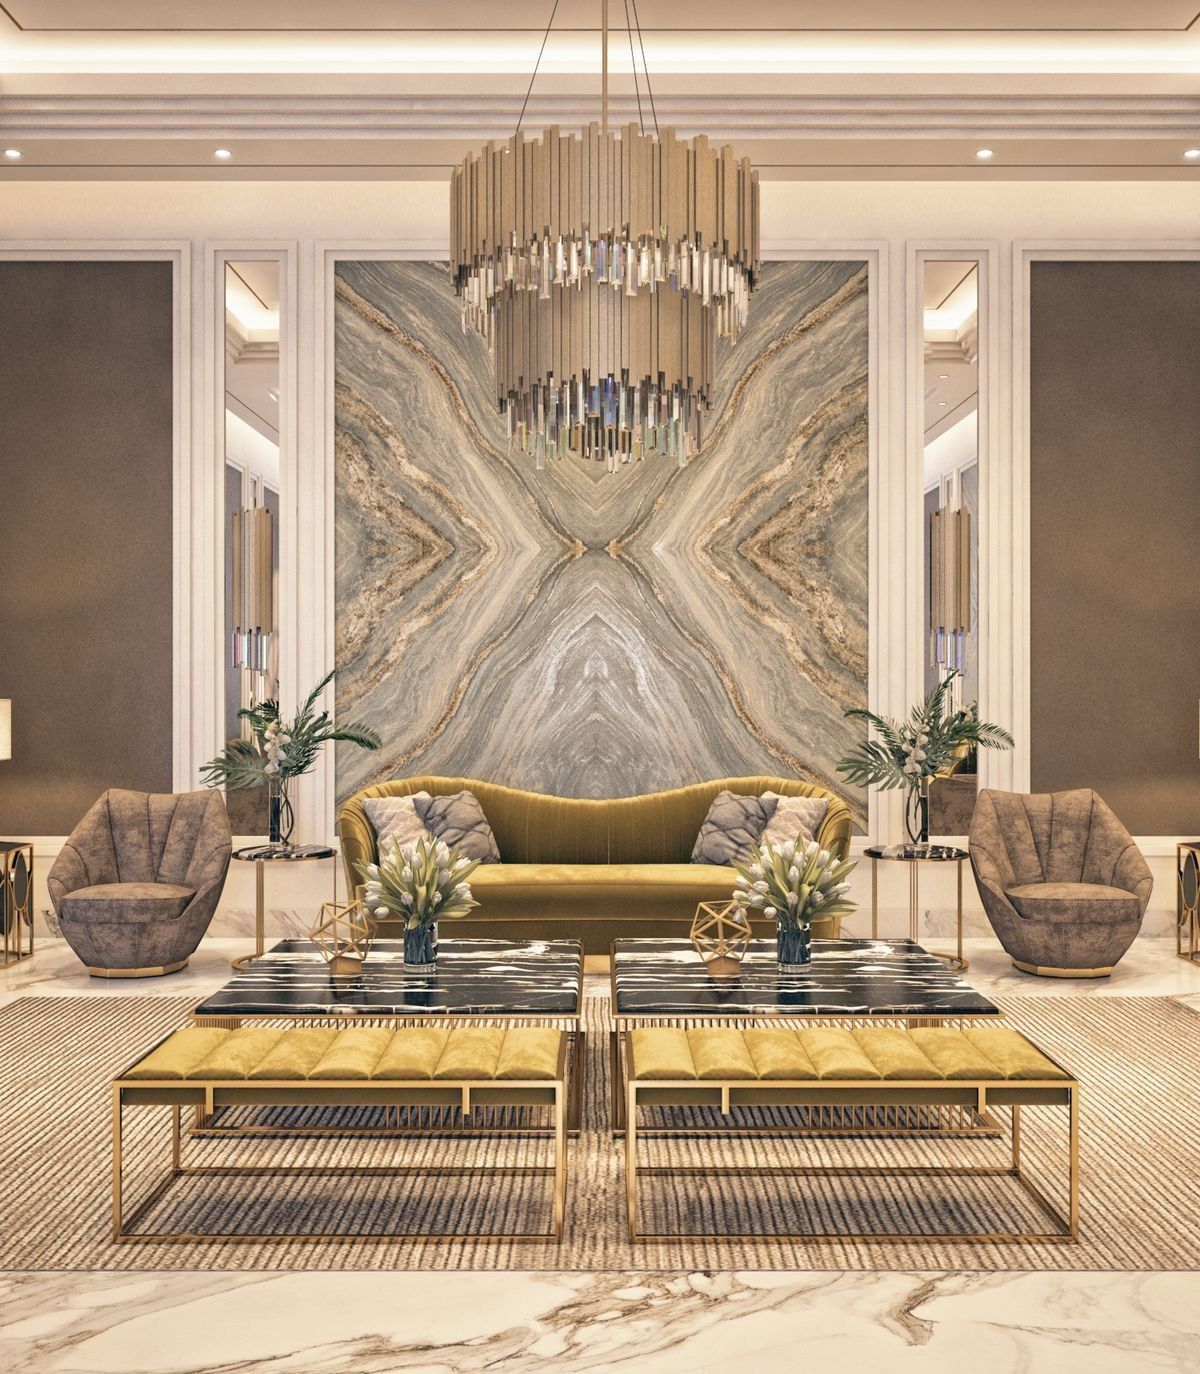 Kelly Sofa Sofa Design By Koket In 2020 Luxury Living Room Living Room Design Modern Luxury Living Room Design